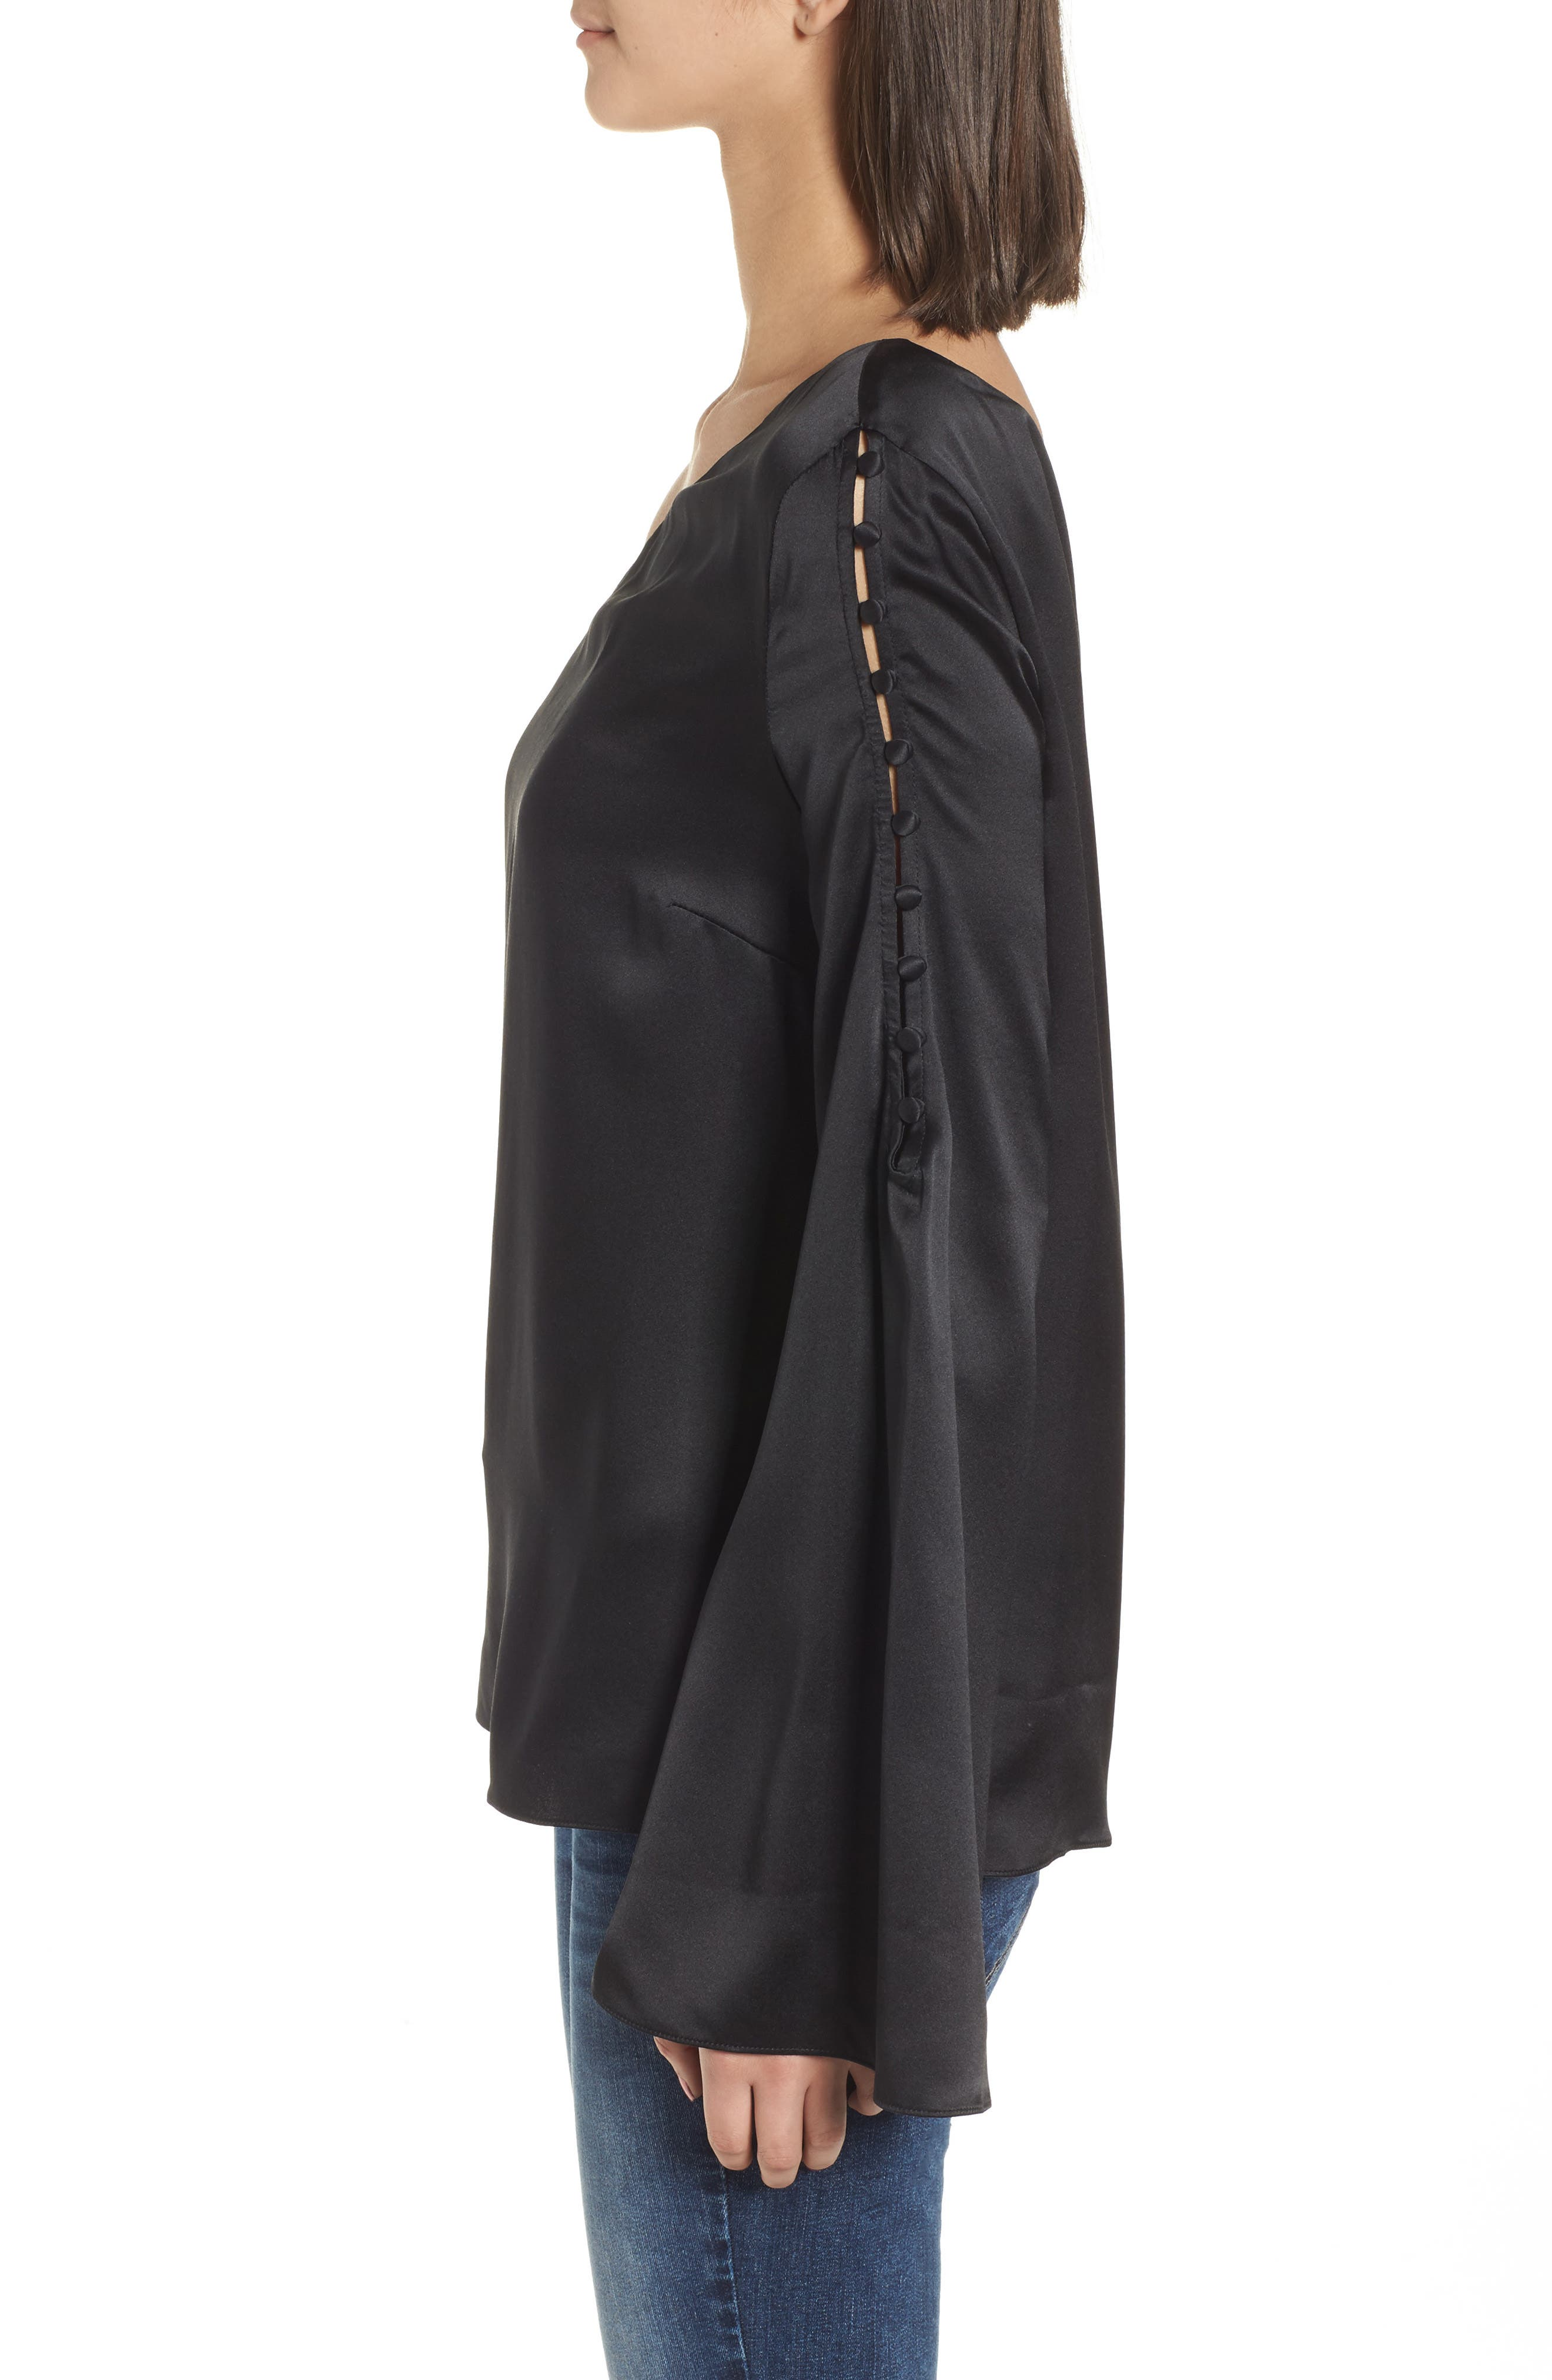 Ripley One-Shoulder Silk Blouse,                             Alternate thumbnail 3, color,                             Black